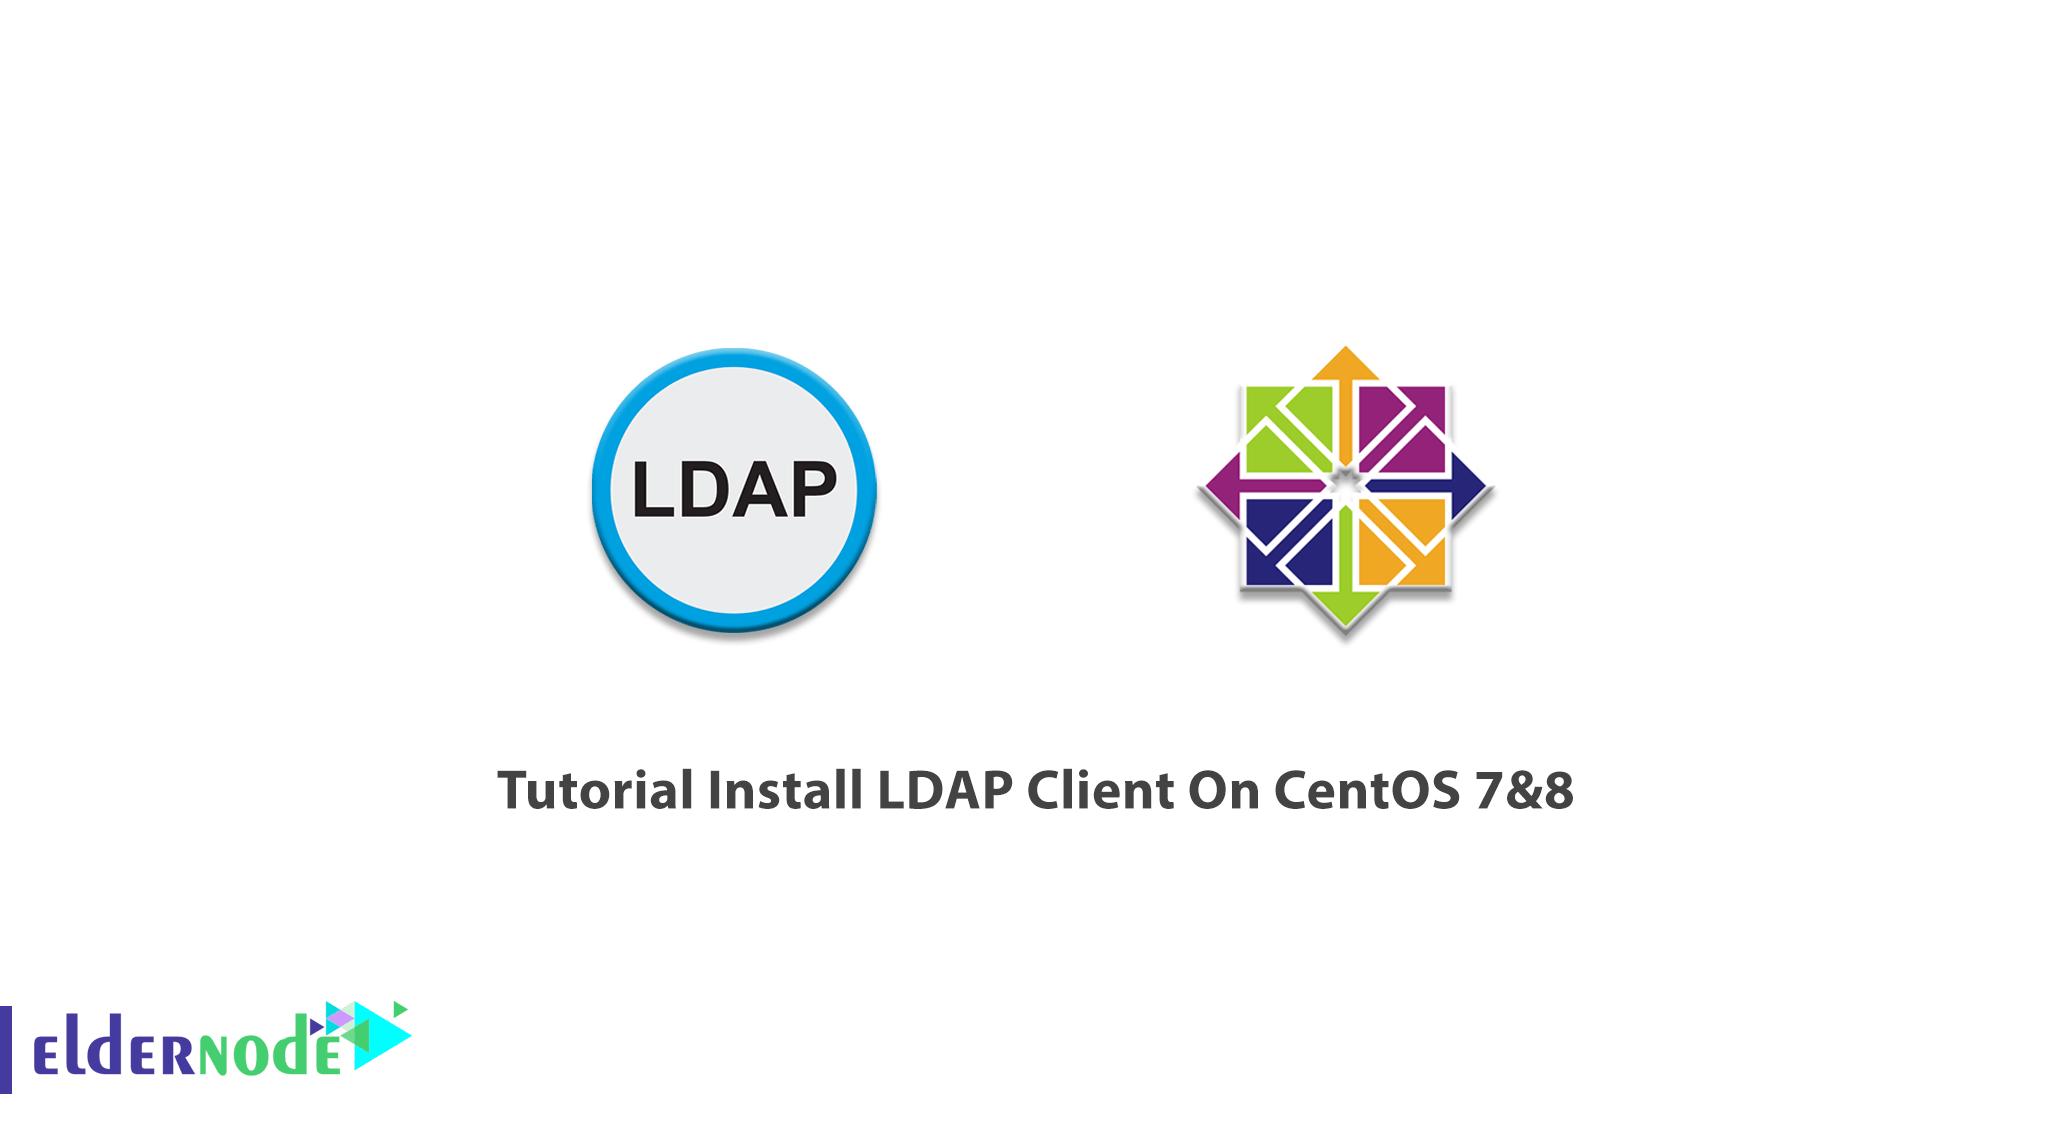 Tutorial Install LDAP Client On CentOS 7&8